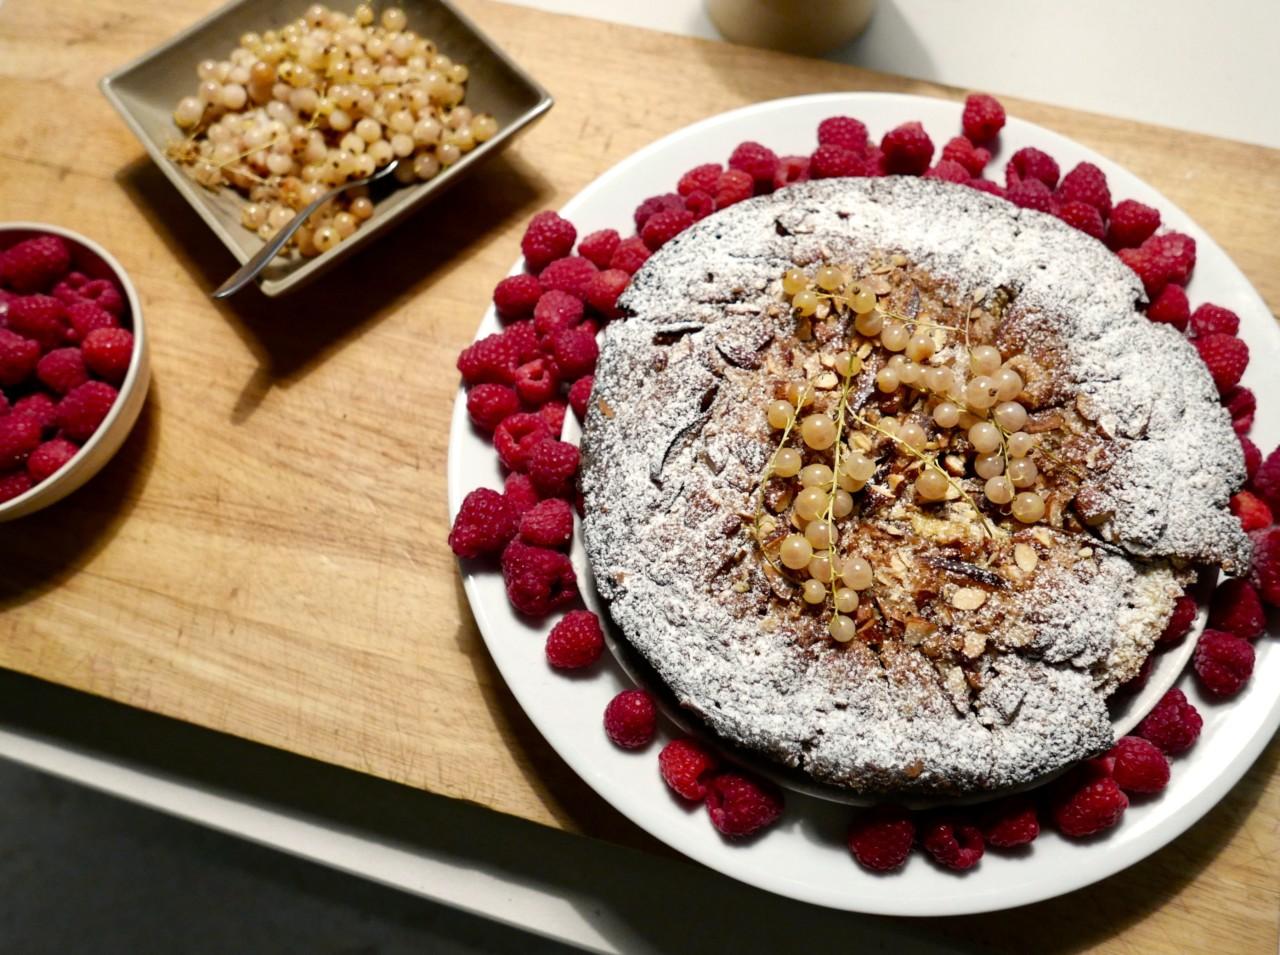 okologisk-kake-bringebar-servering-duftkurs-naturales-green-house